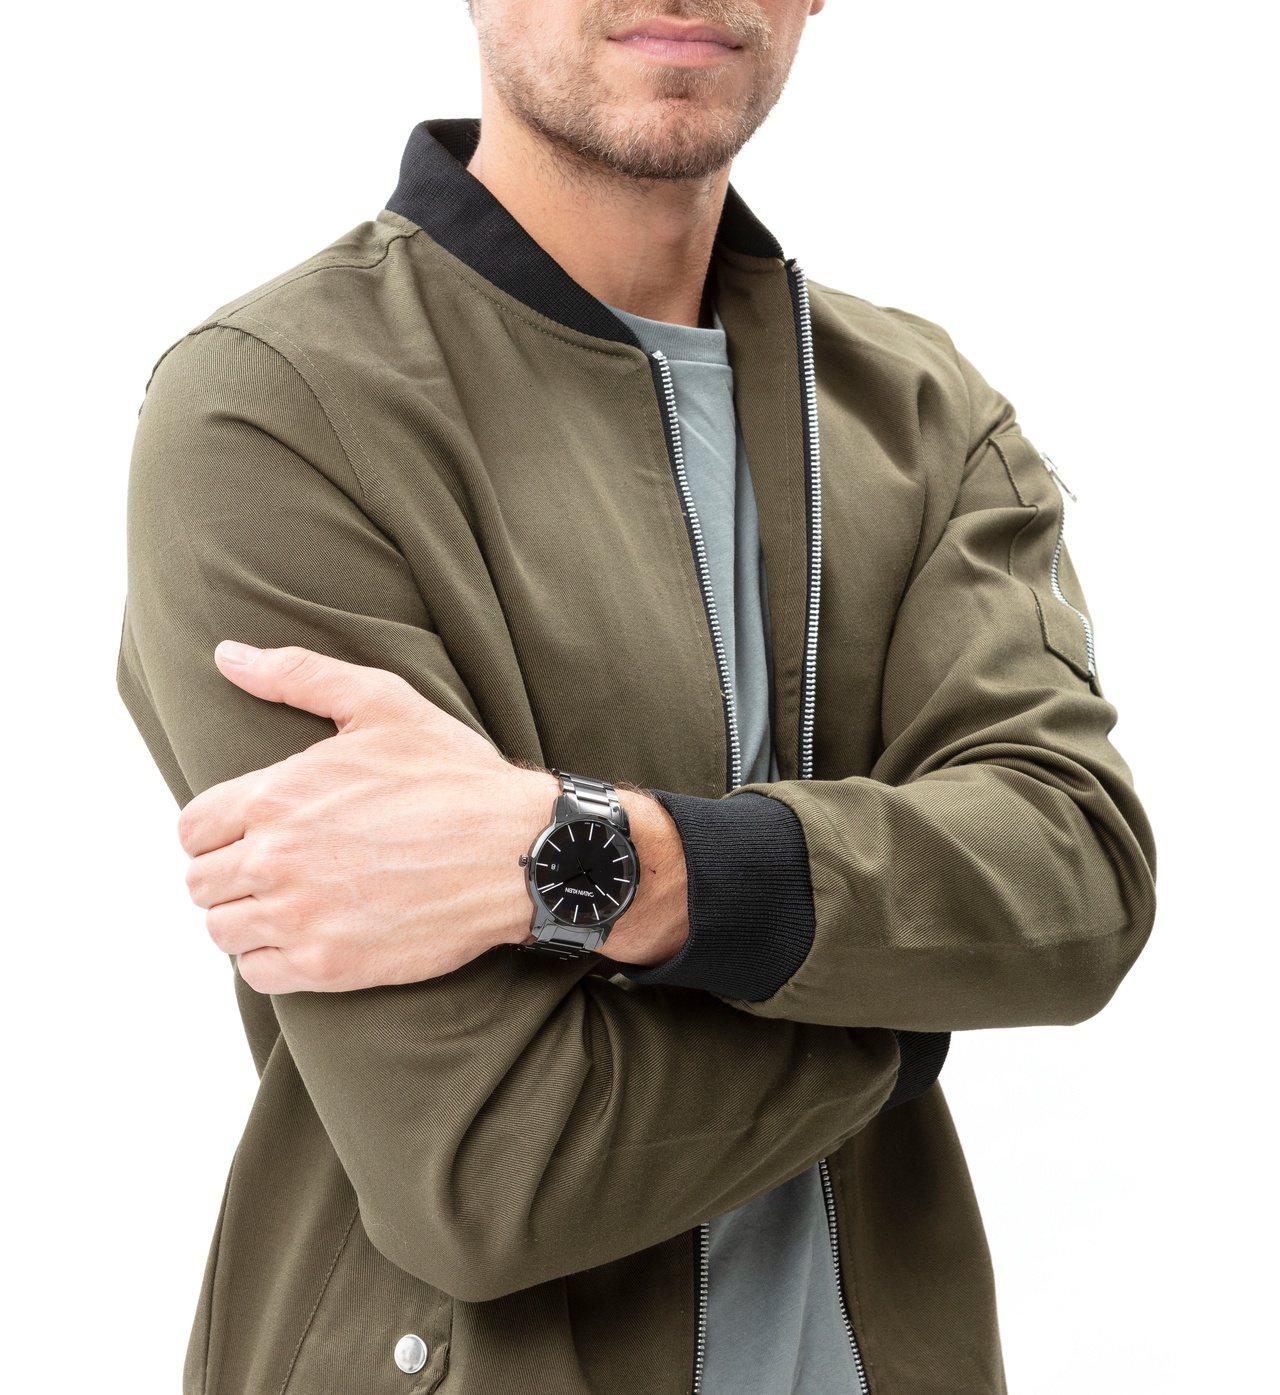 CK腕表首飾推出新品,從city都會系列推出全新經典延伸款,約10,100元。圖...